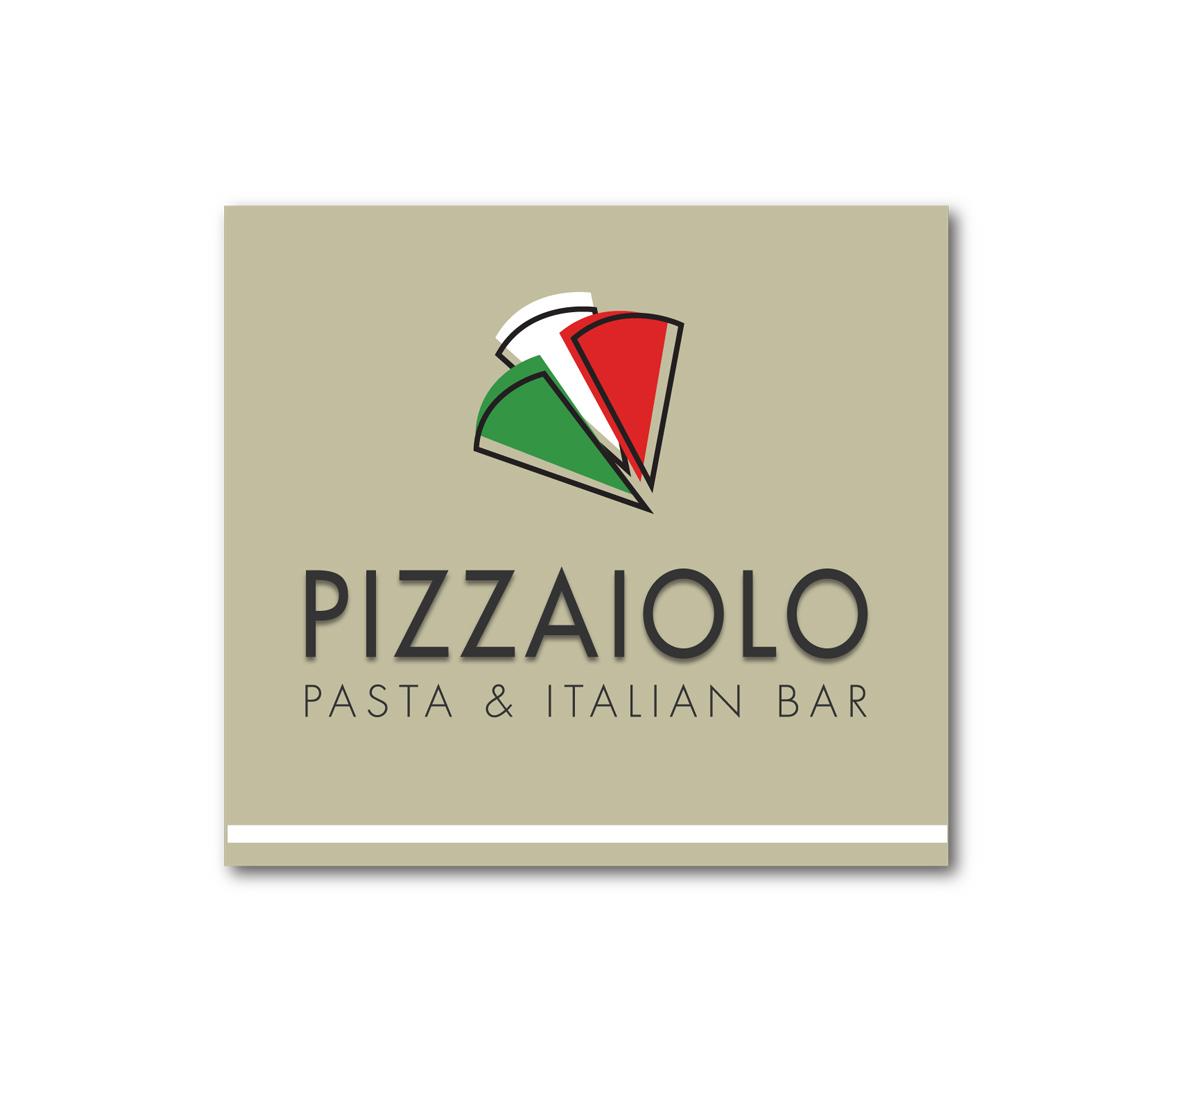 italian restaurant logos dorit mercatodos co rh dorit mercatodos co italian restaurant lagos portugal italian restaurant gosforth